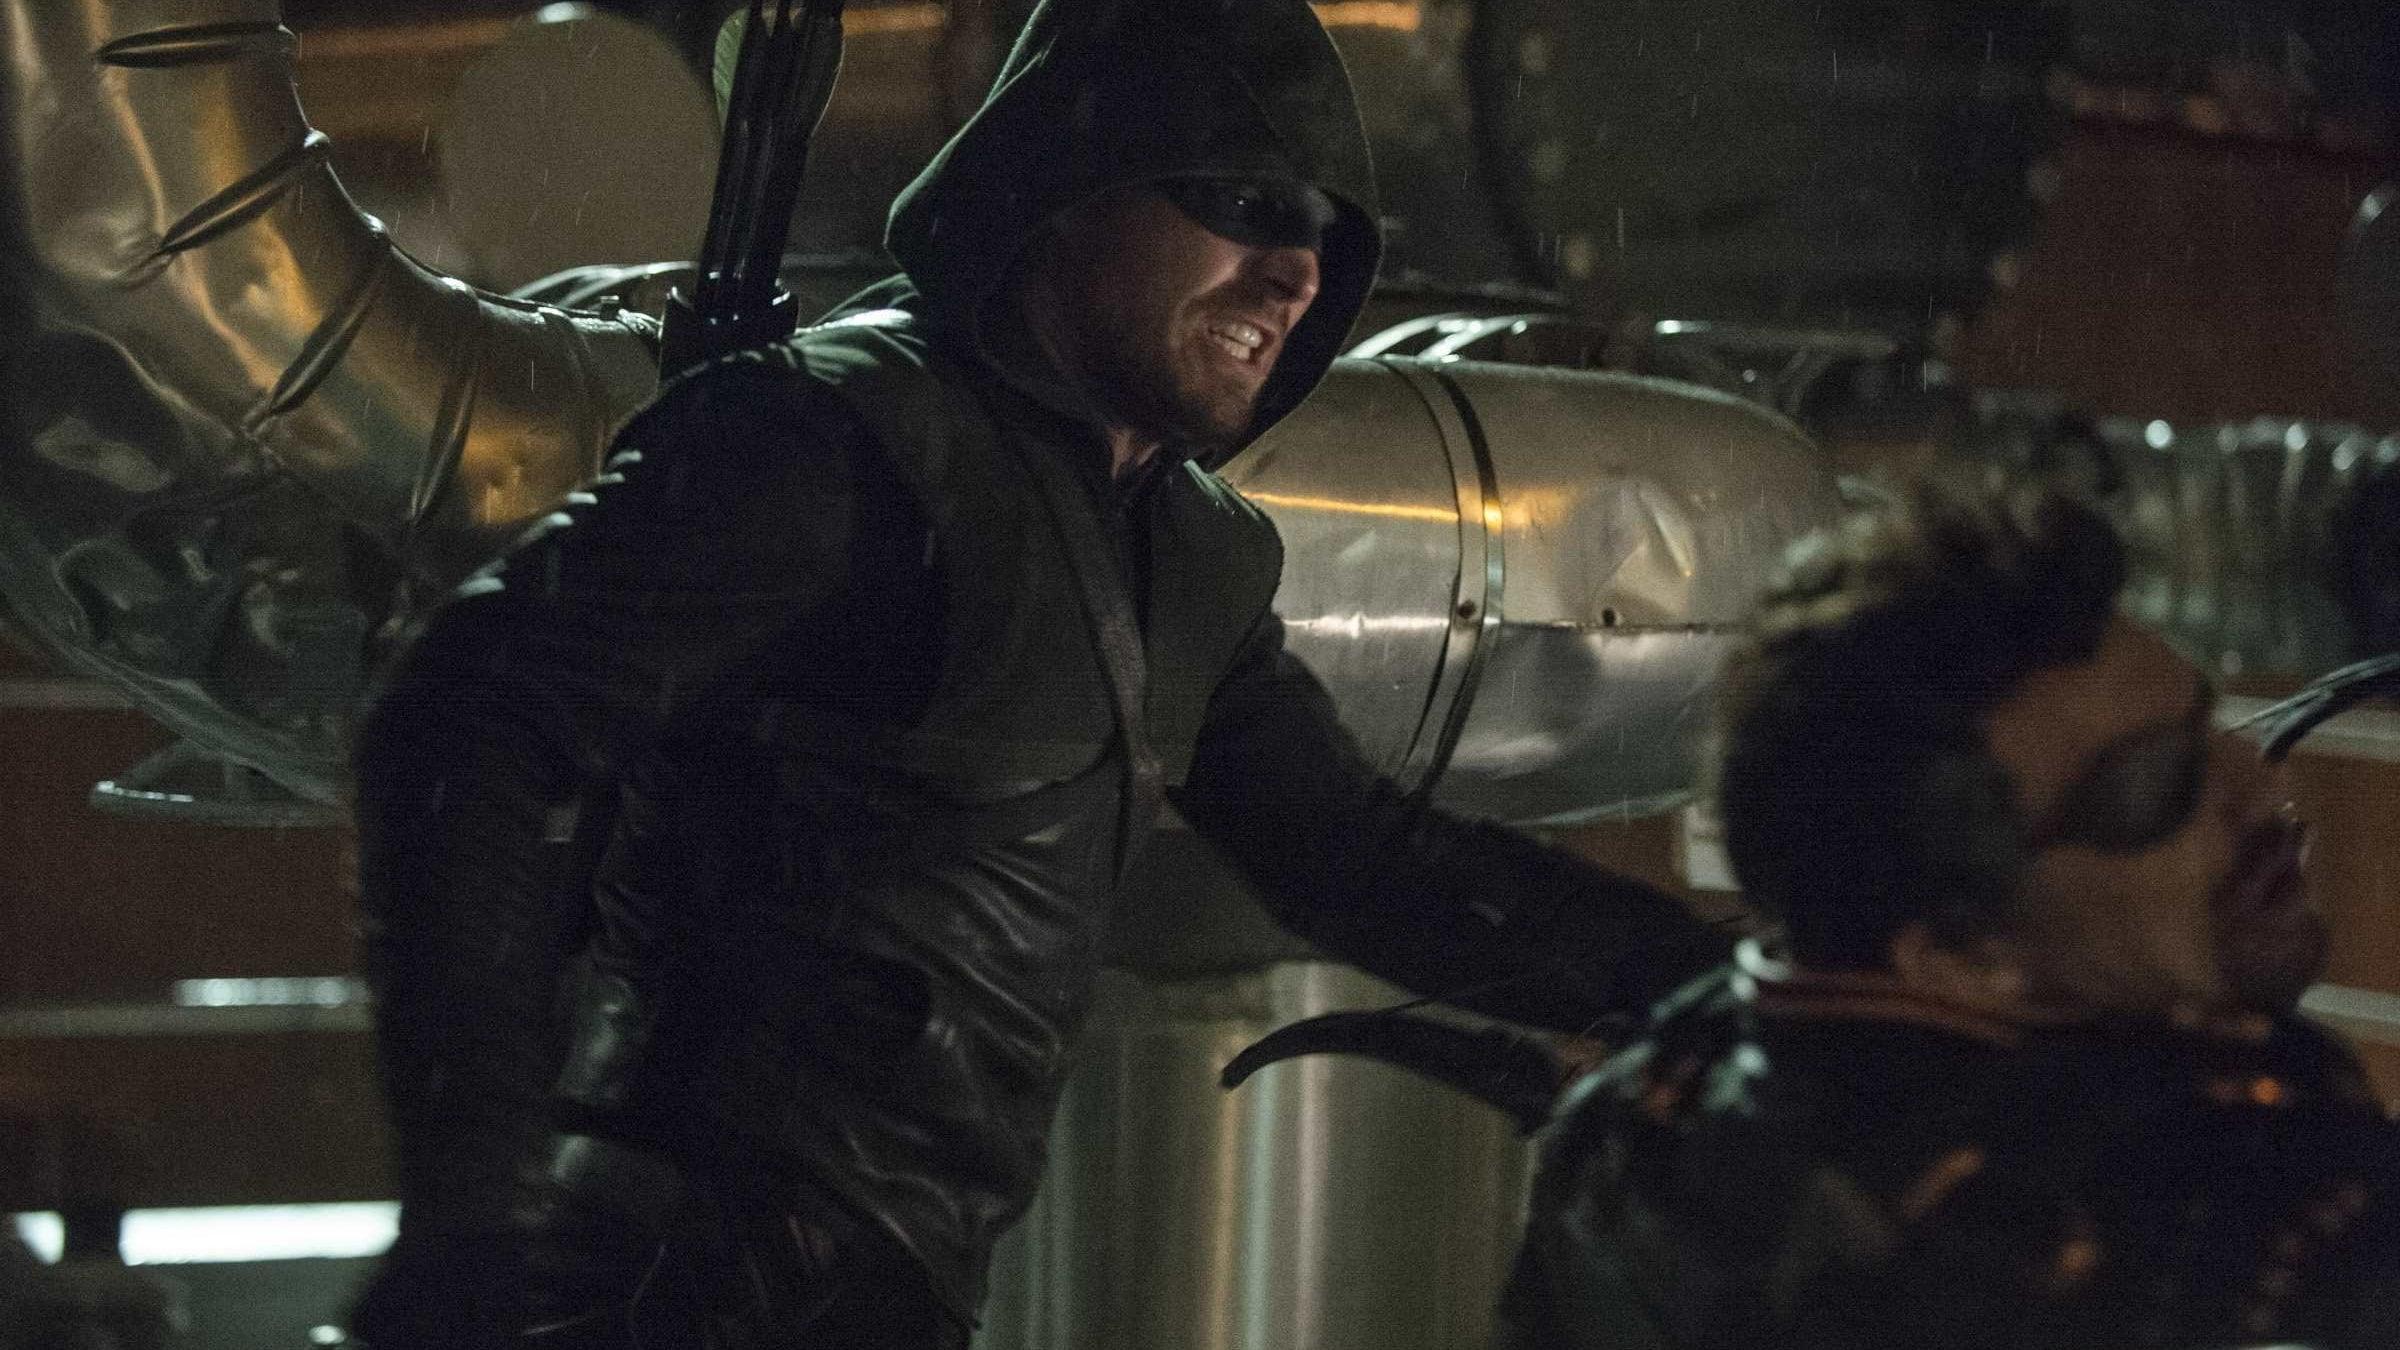 Arrow - Season 2 Episode 23 : Unthinkable